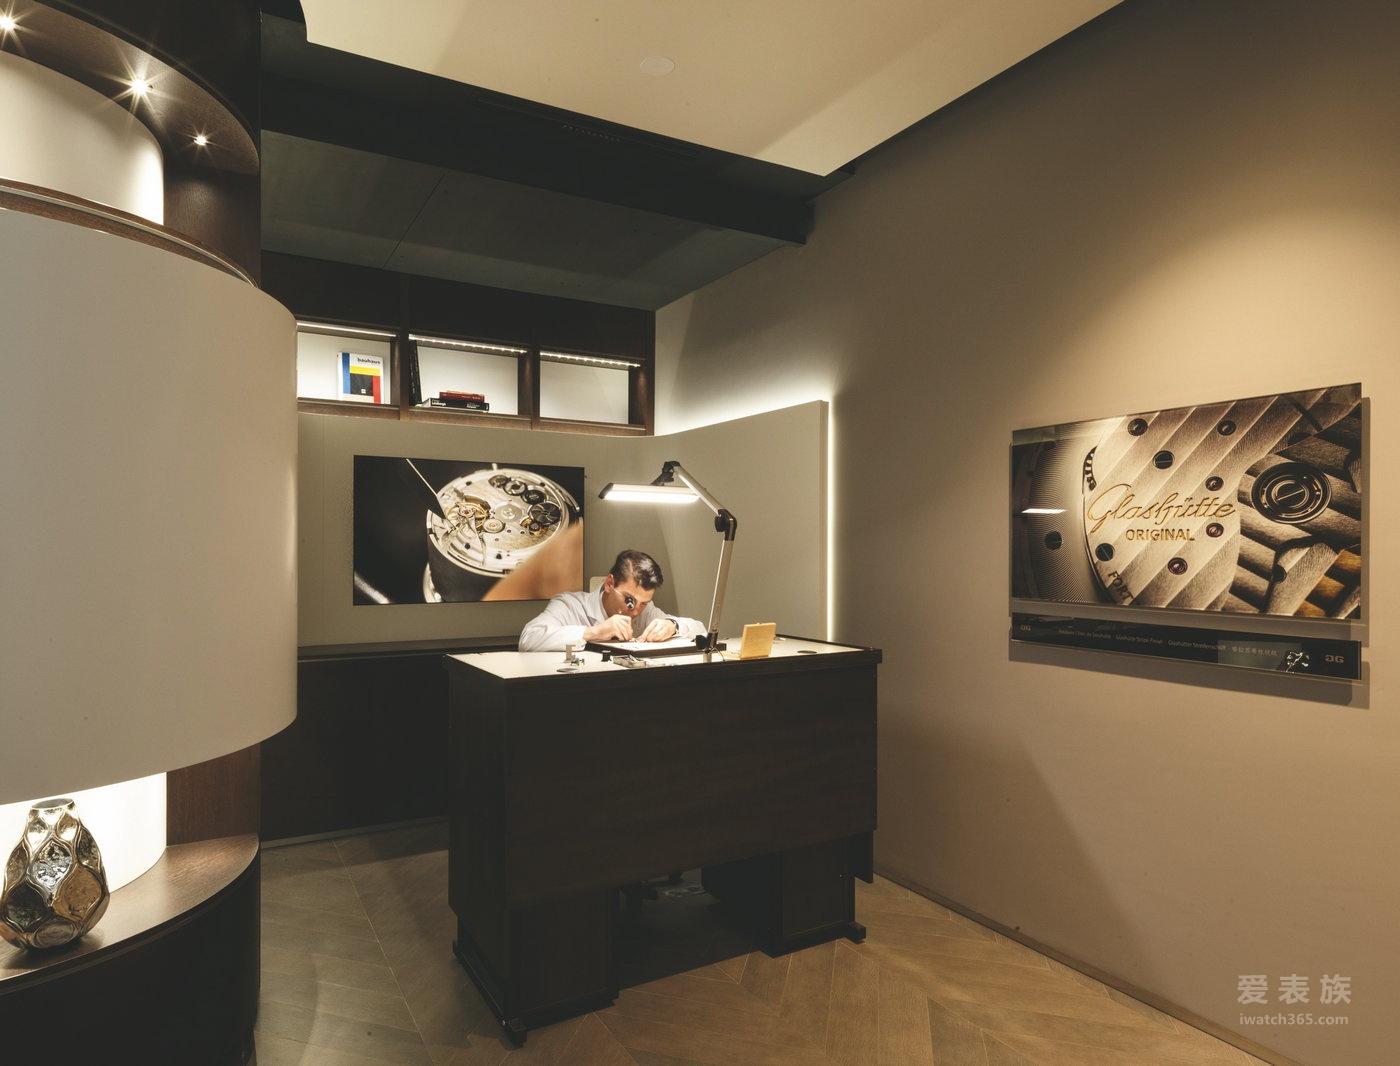 Glashütte Original格拉苏蒂原创再拓全球版图 全新品牌精品店落户维也纳和巴黎